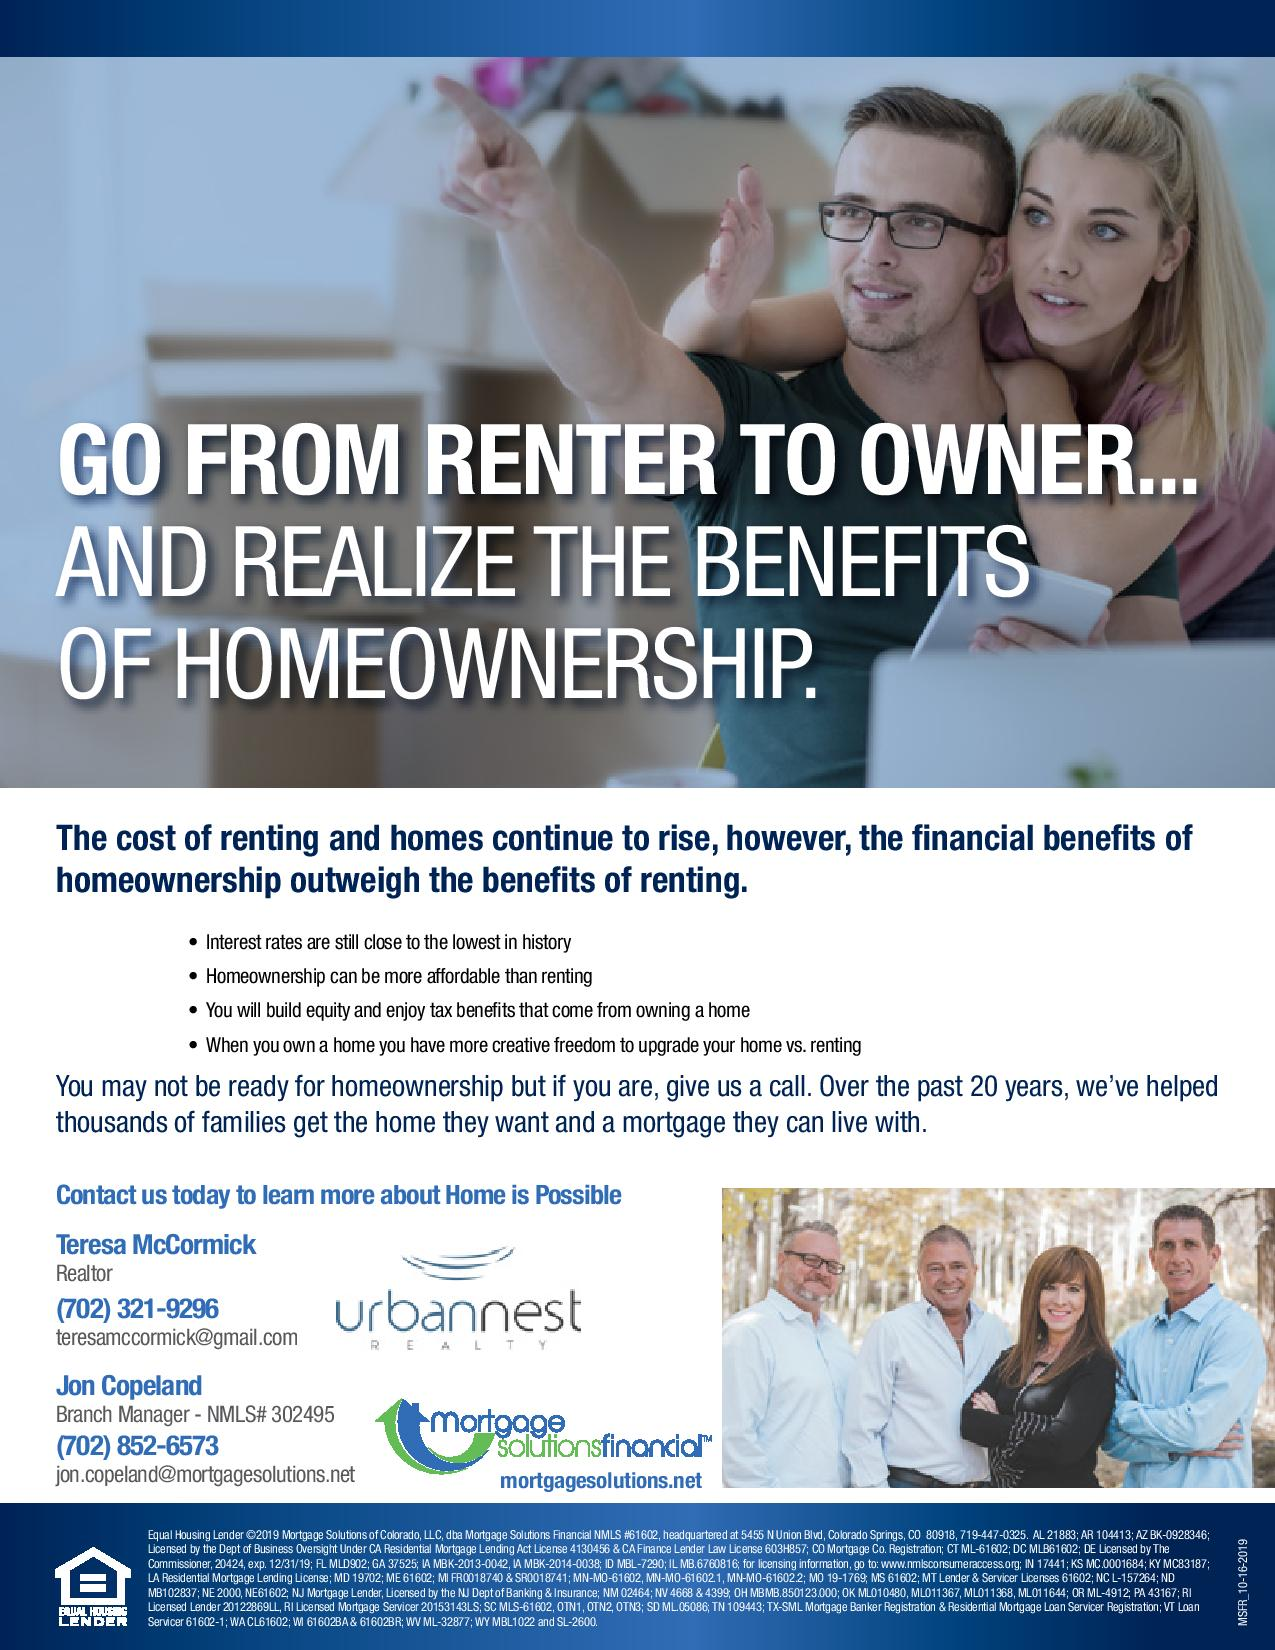 Comparison of Rent vs Own